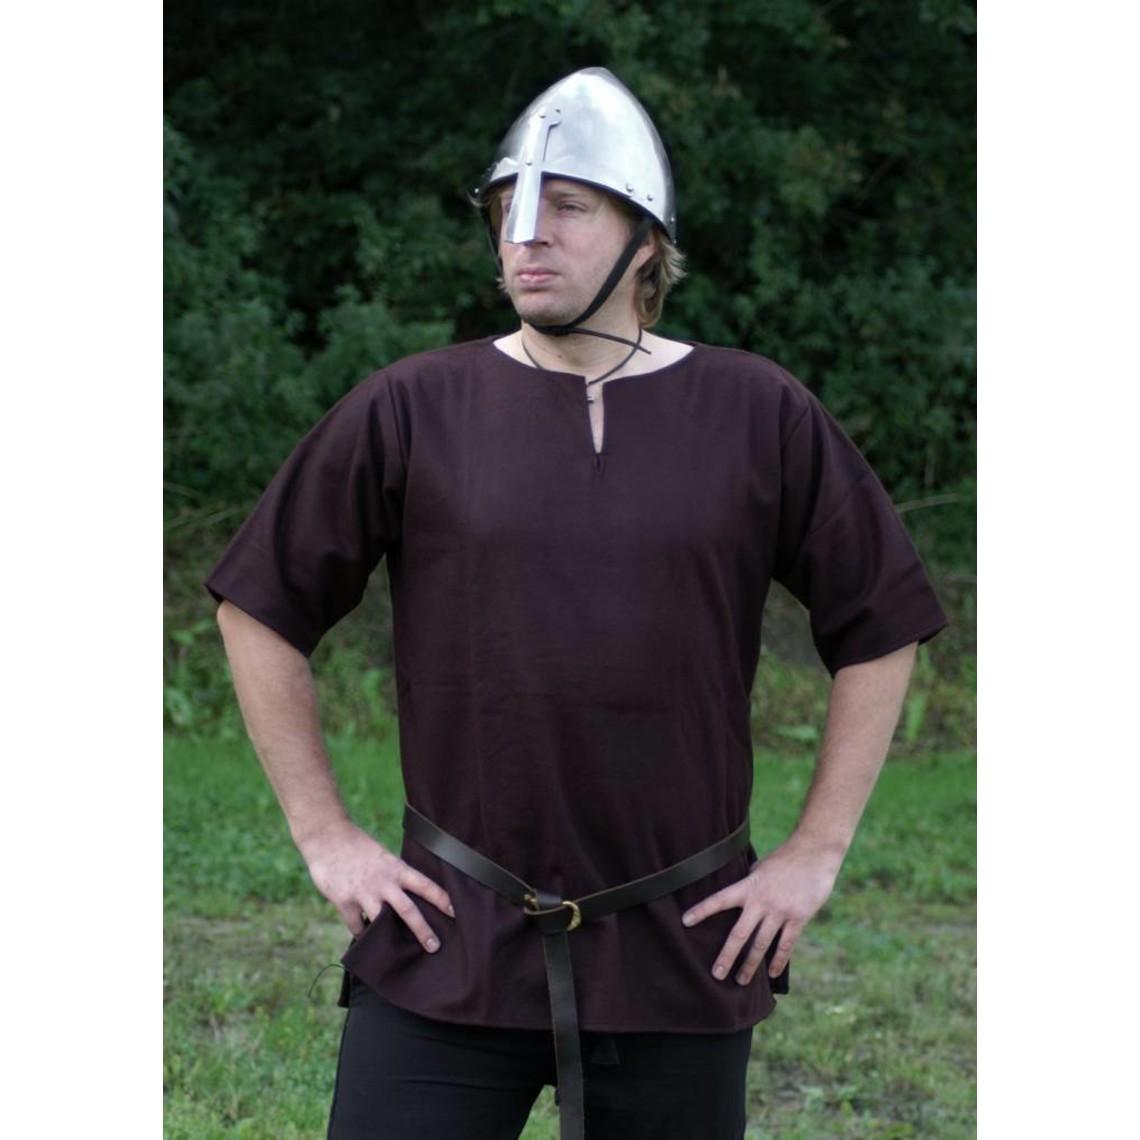 Ulfberth Vikingtuniek met korte mouwen, bruin